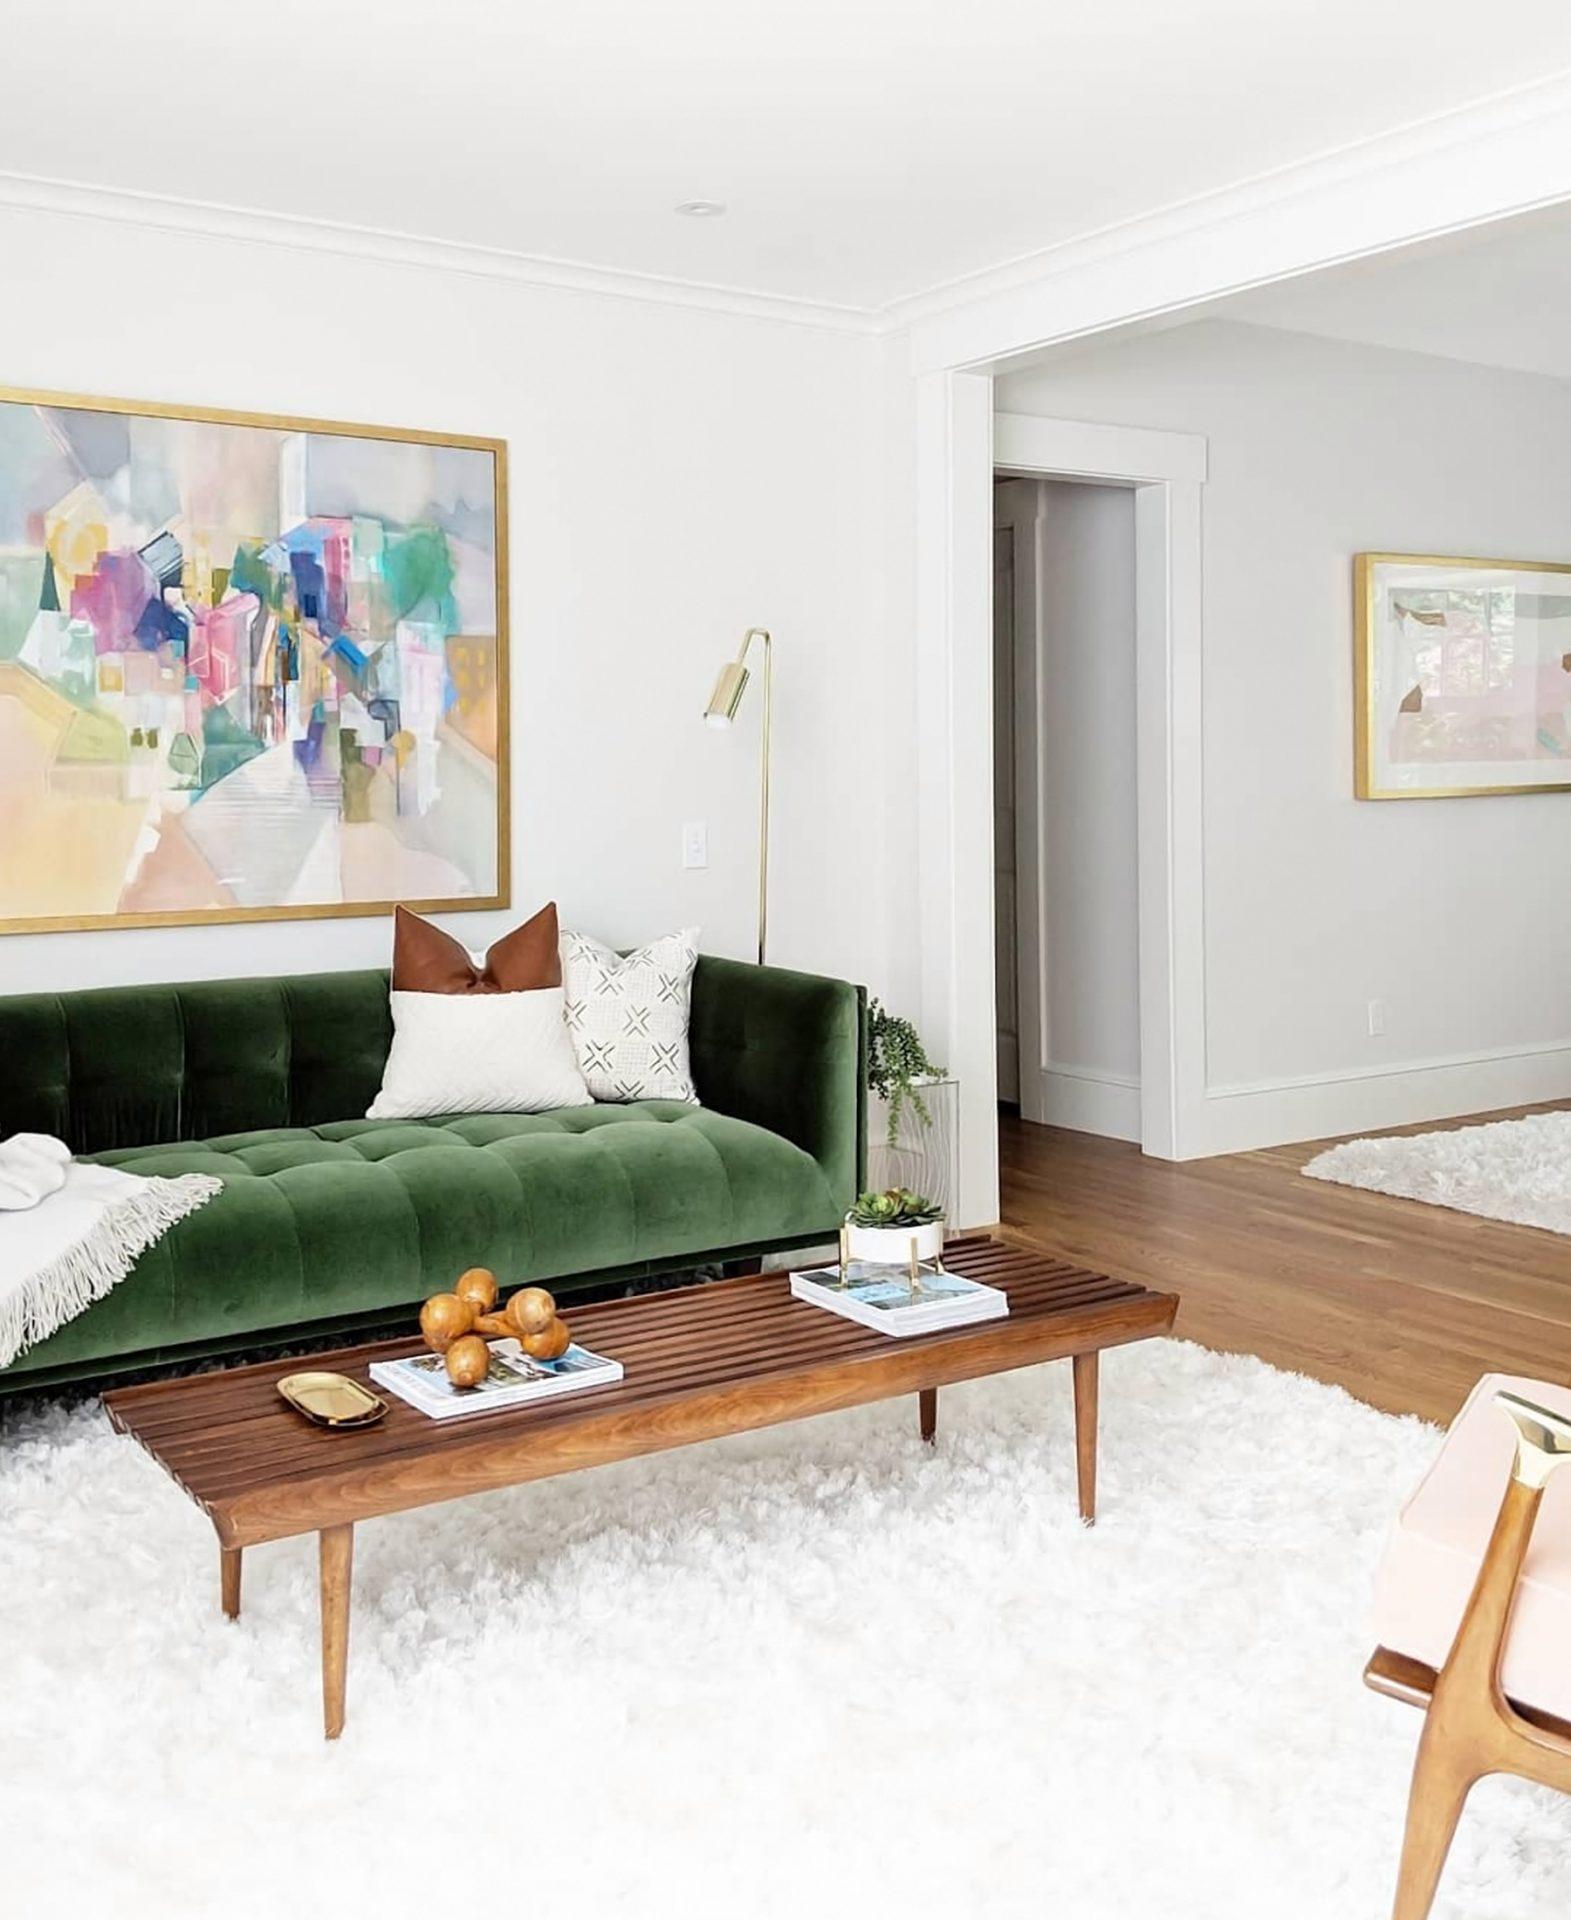 Gemma van der Swaagh shows off the grass green velvet Article sofa in her bedroom.